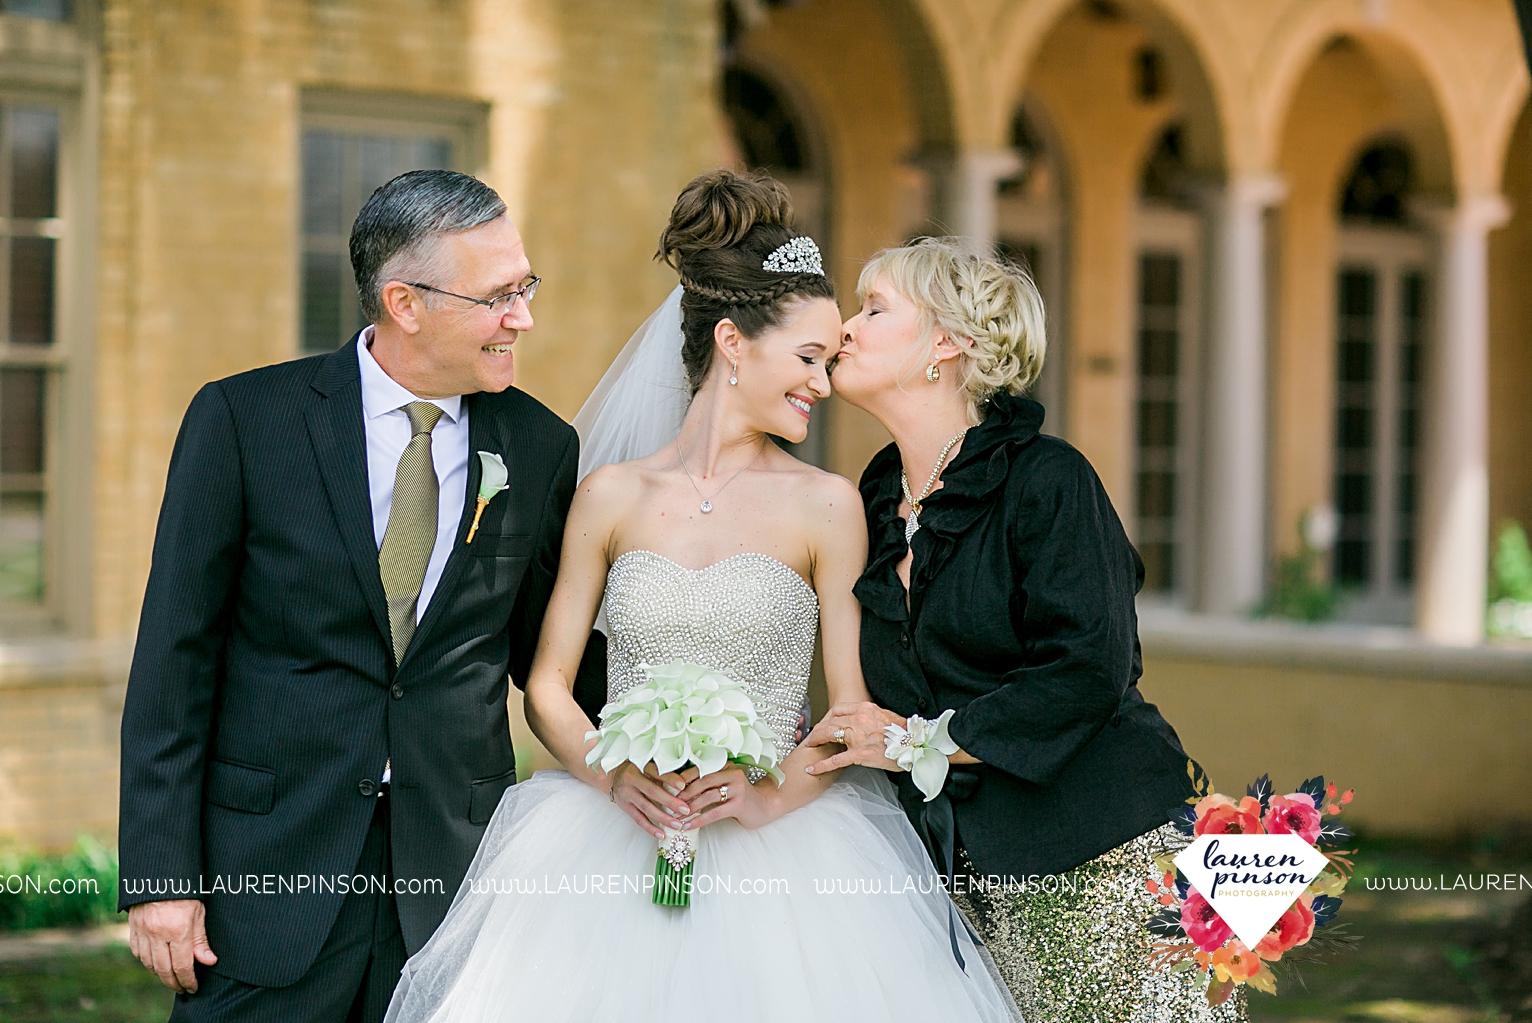 wichita-falls-texas-wedding-photographer-the-forum-by-the-kemp-mayfield-events-ulta-gold-glitter_2849.jpg